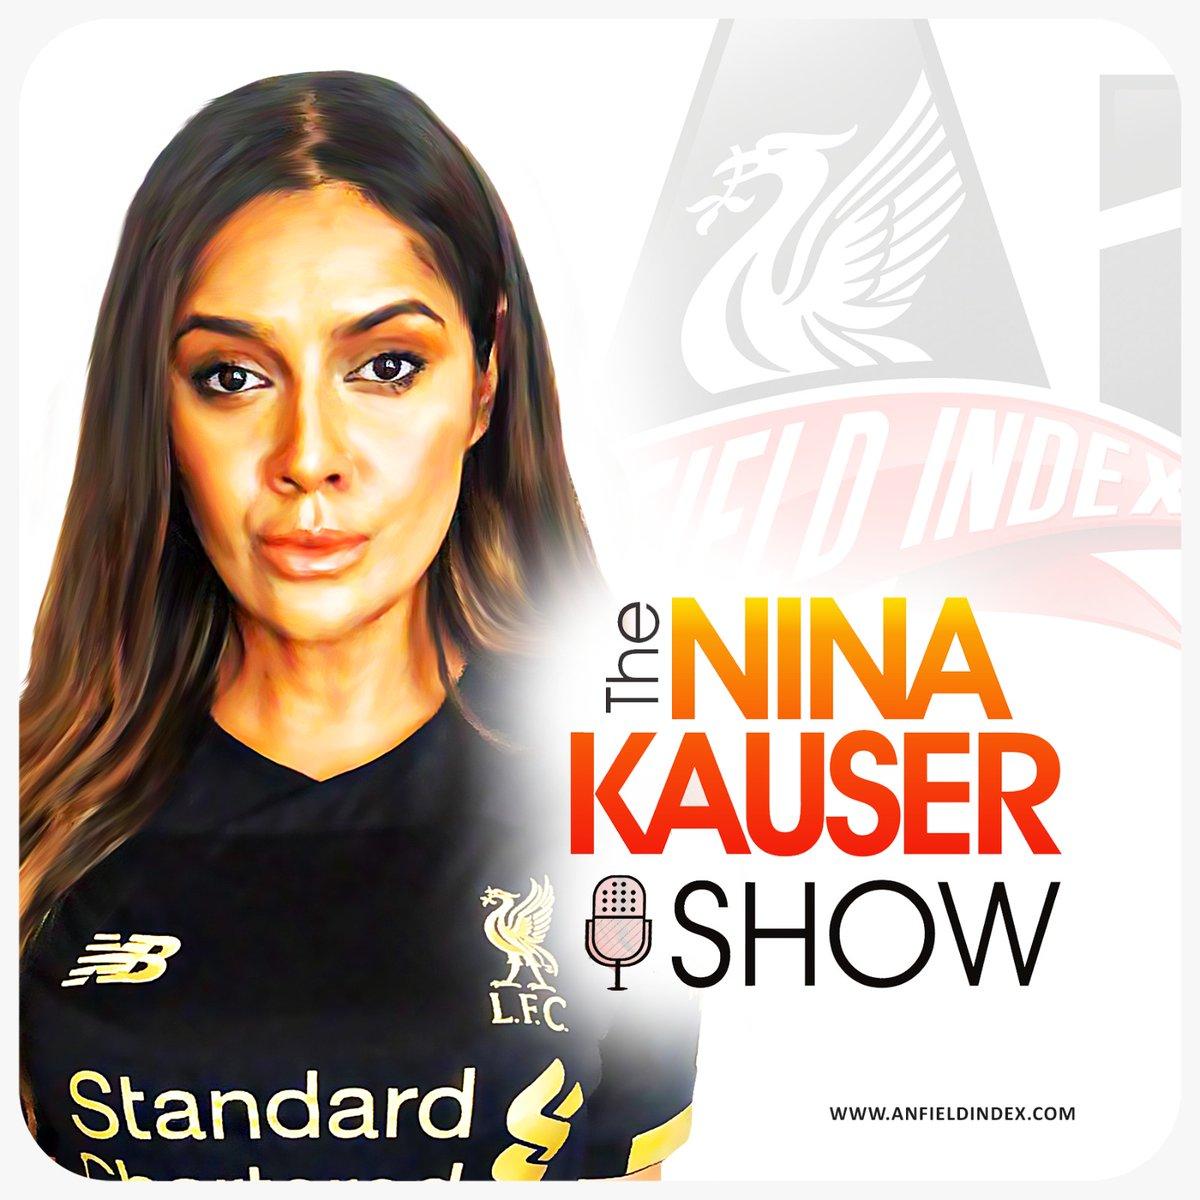 The @NinaKauser Show: #LIVLEI  With: @Samboevans & @ragingbassuk  Callers: @GagsTandon & @MadScouser2012  Listen: